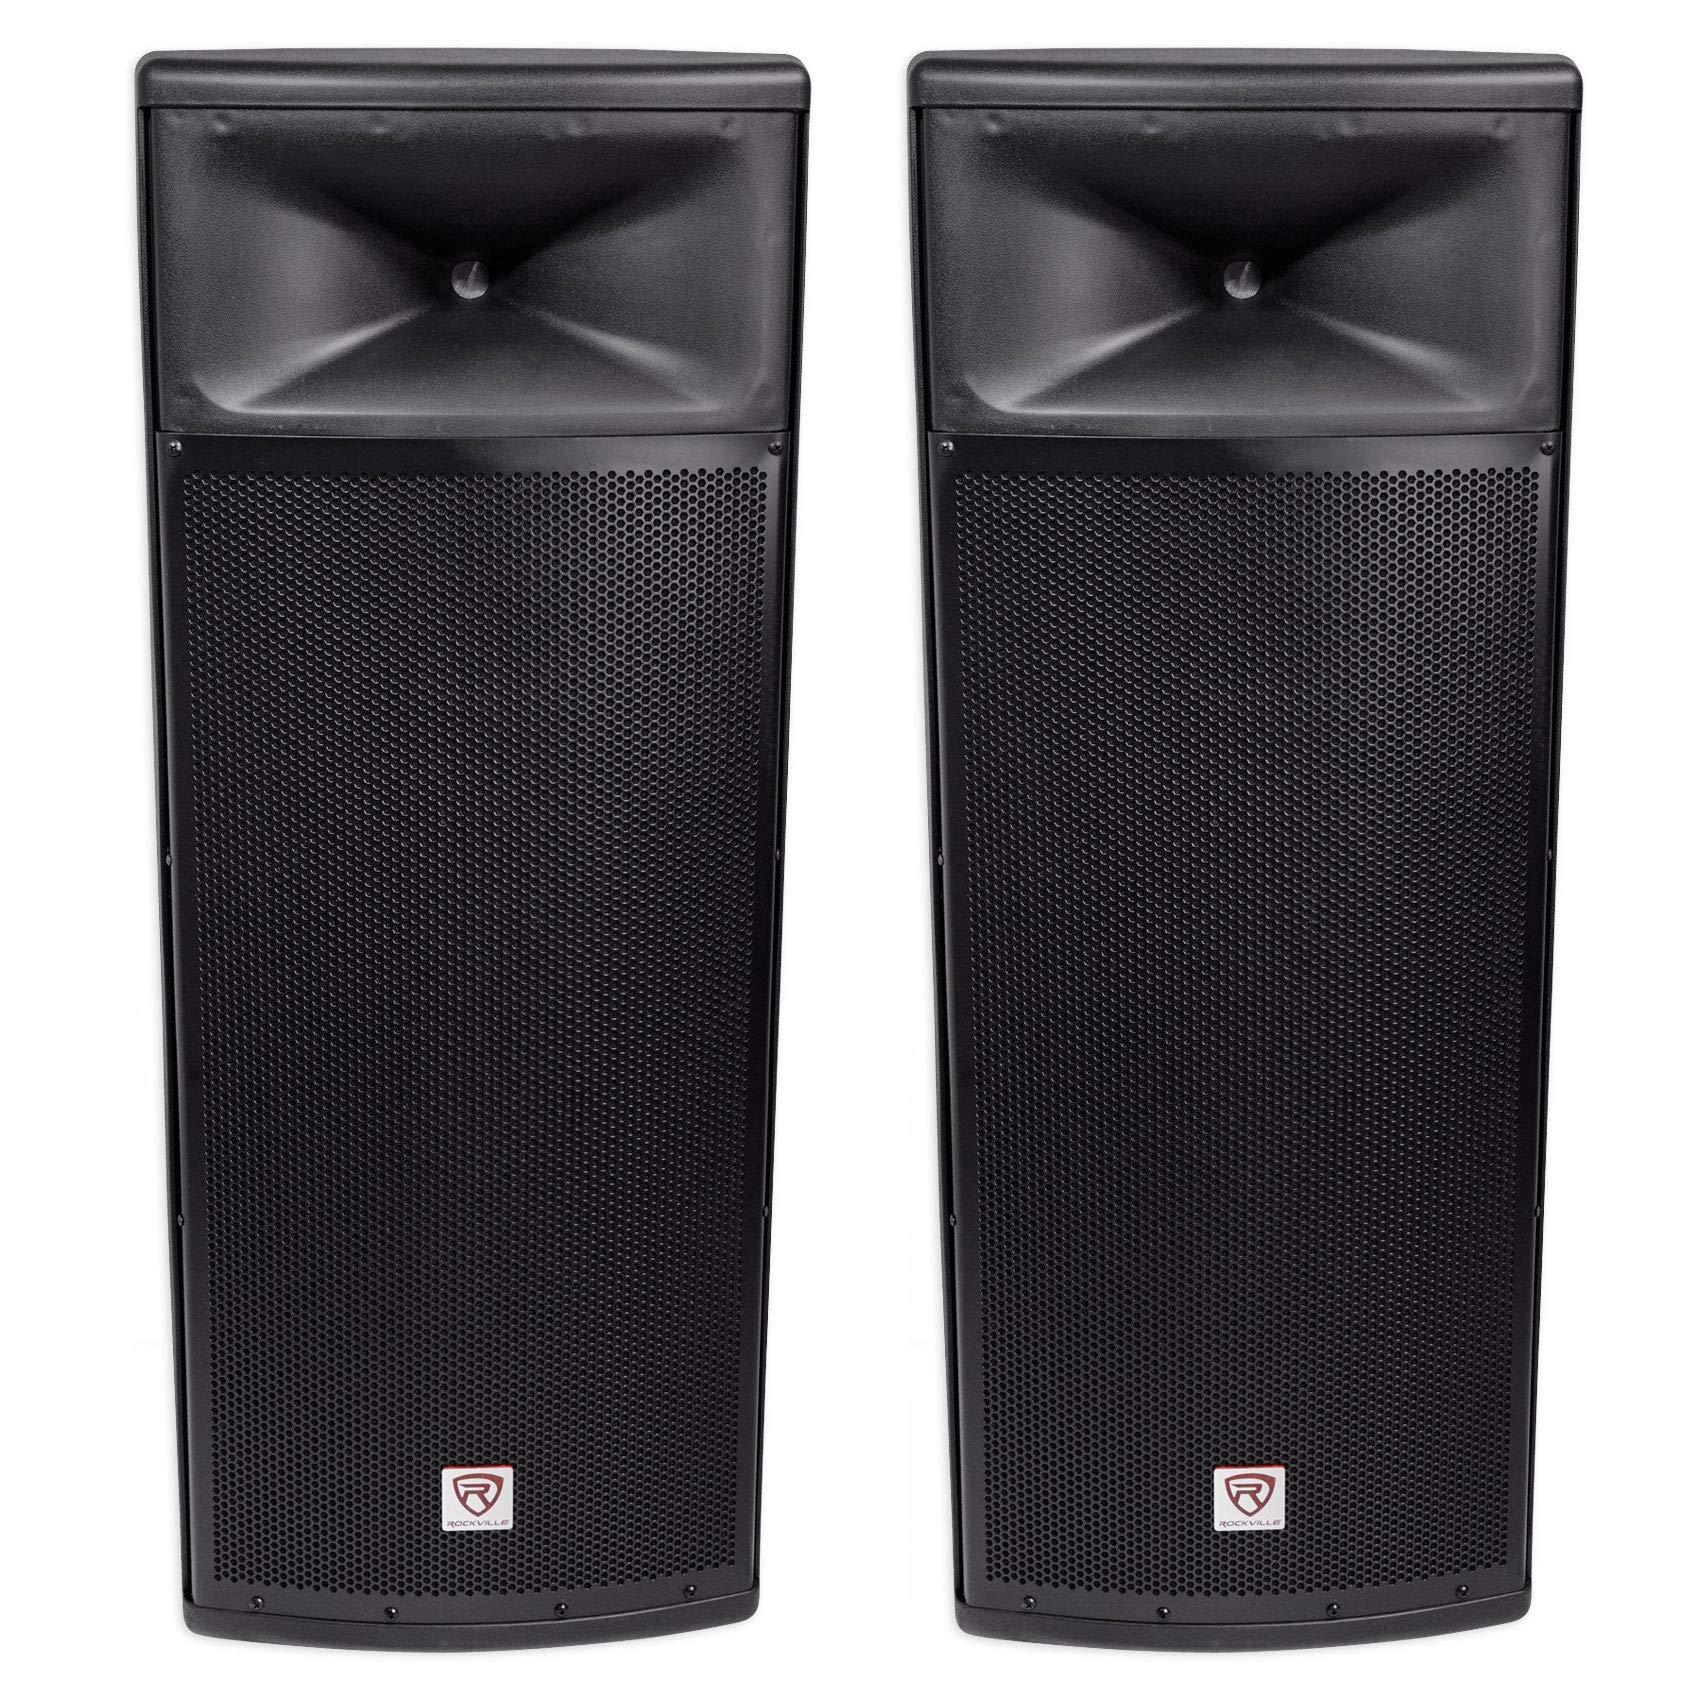 Pair Rockville SPGN258 Dual 15'' 3000w 8-Ohm Passive DJ PA Speaker/ABS Cabinet by Rockville